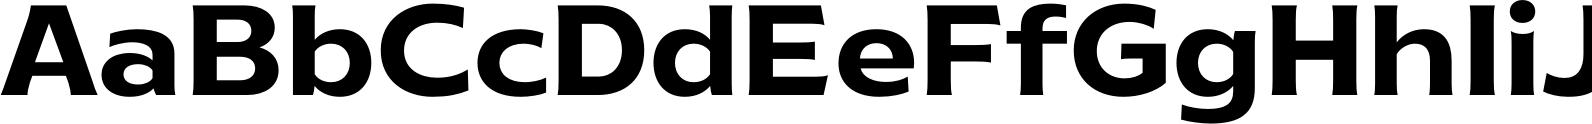 Popular Free Fonts - Most Relevant - YouWorkForThem